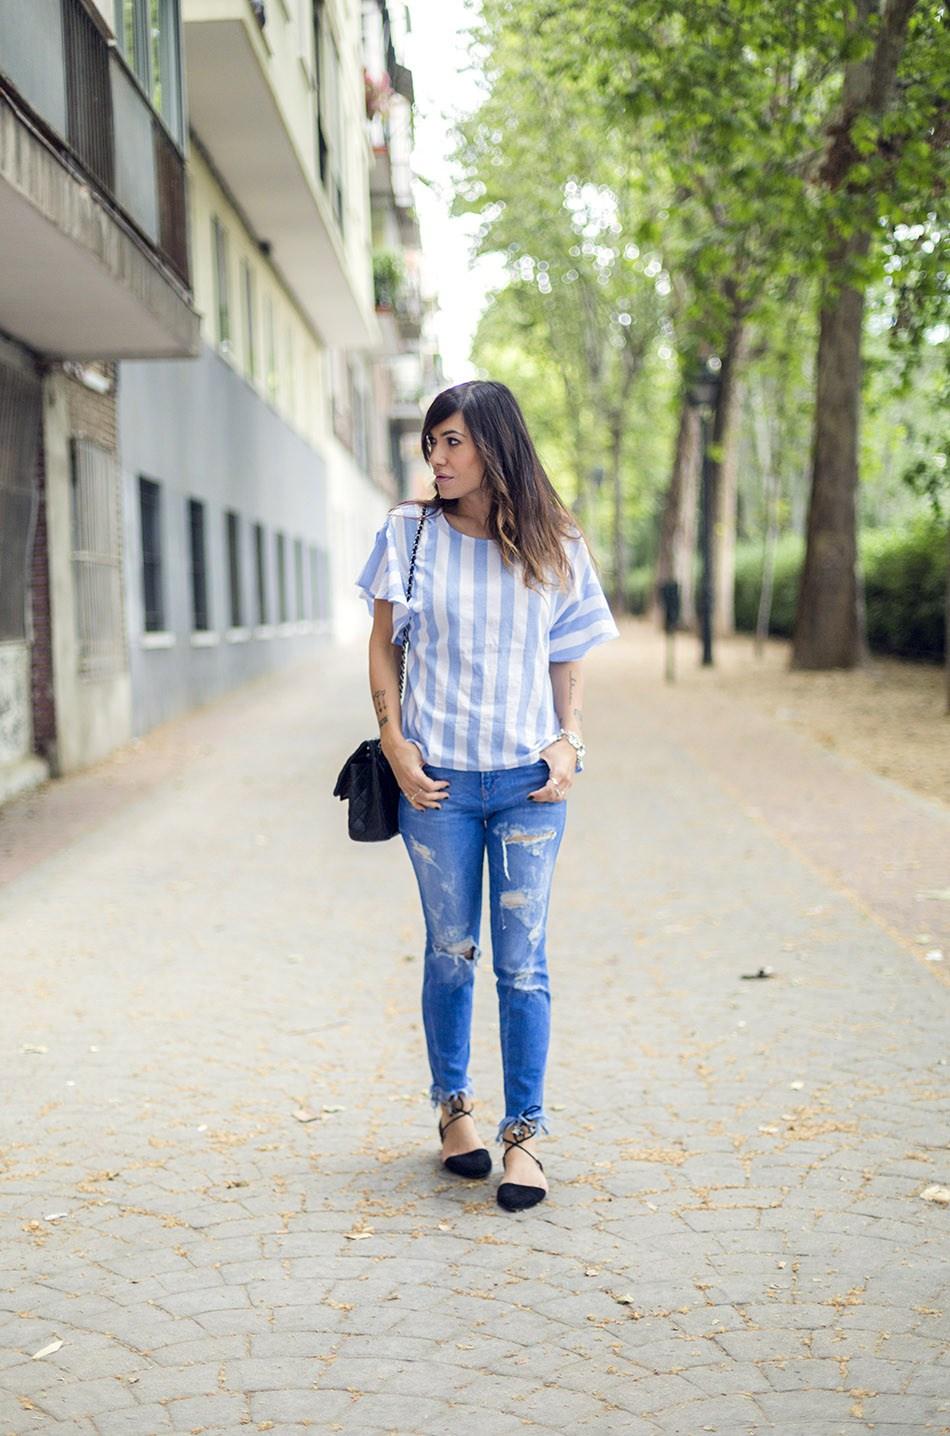 street style june 2016 outfits review bárbara crespo 09